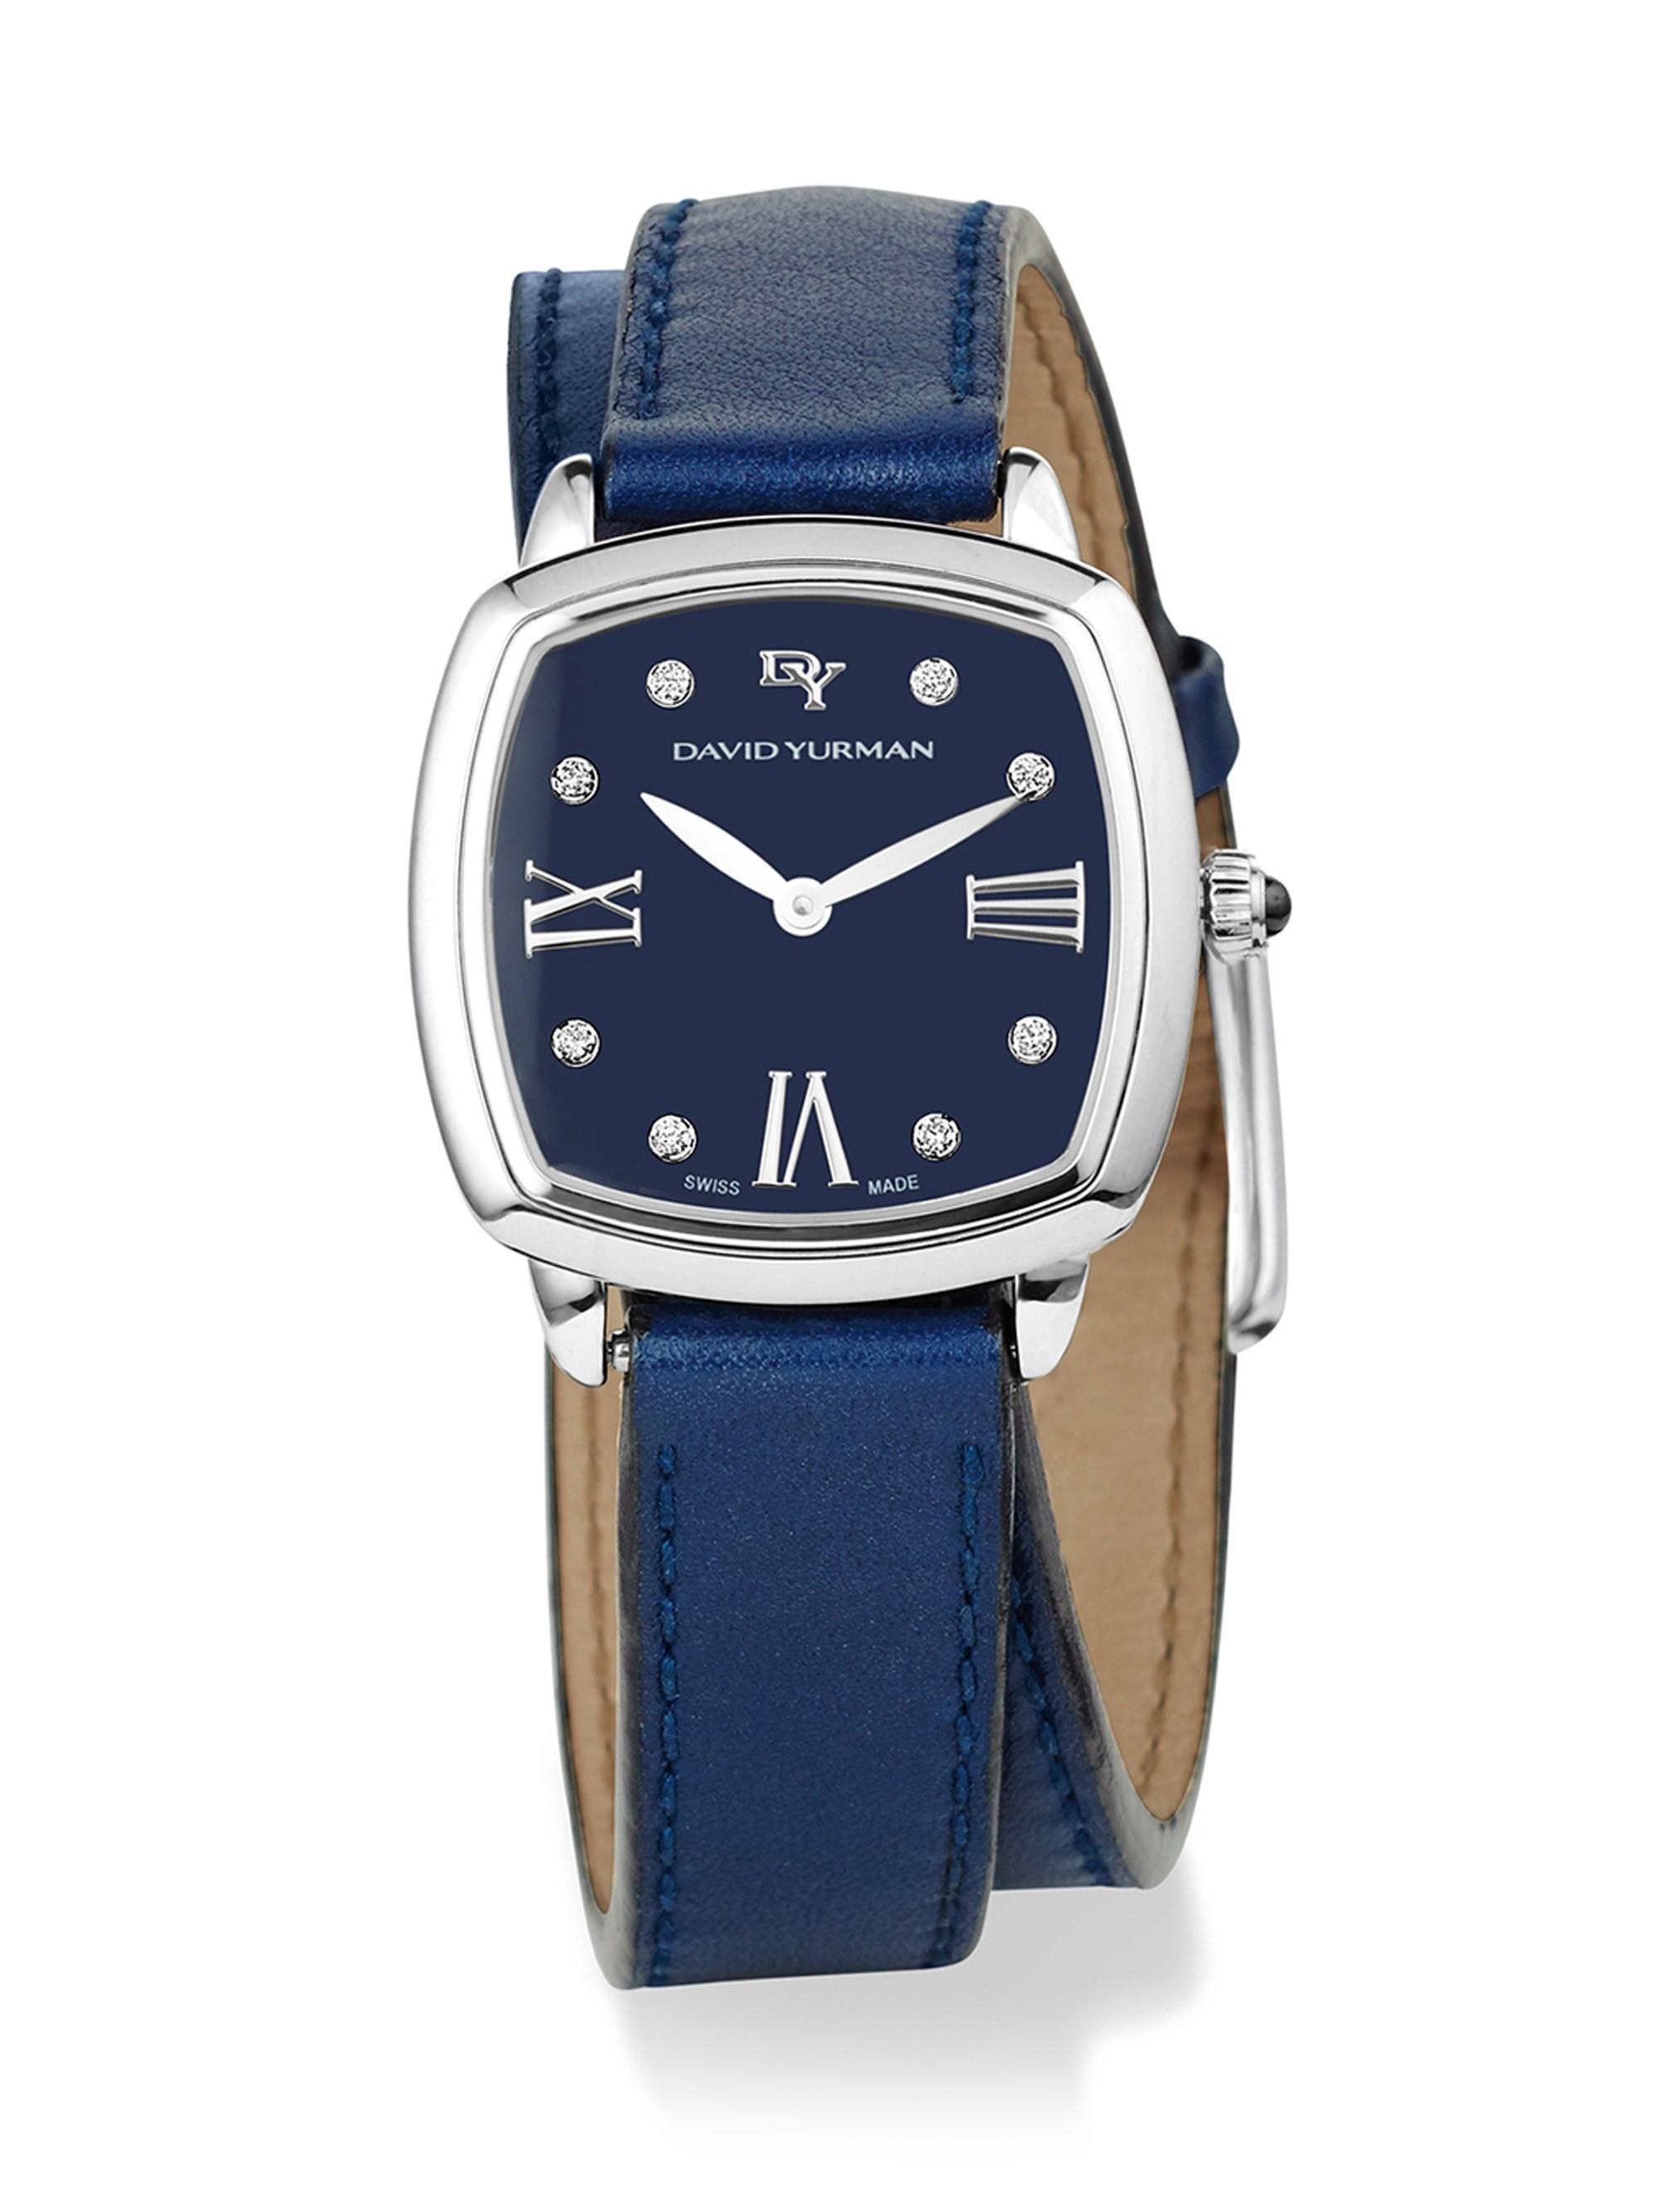 eecb38574 David Yurman Albion 27Mm Leather Swiss Quartz Watch With Diamonds - Black White  Medium Blue